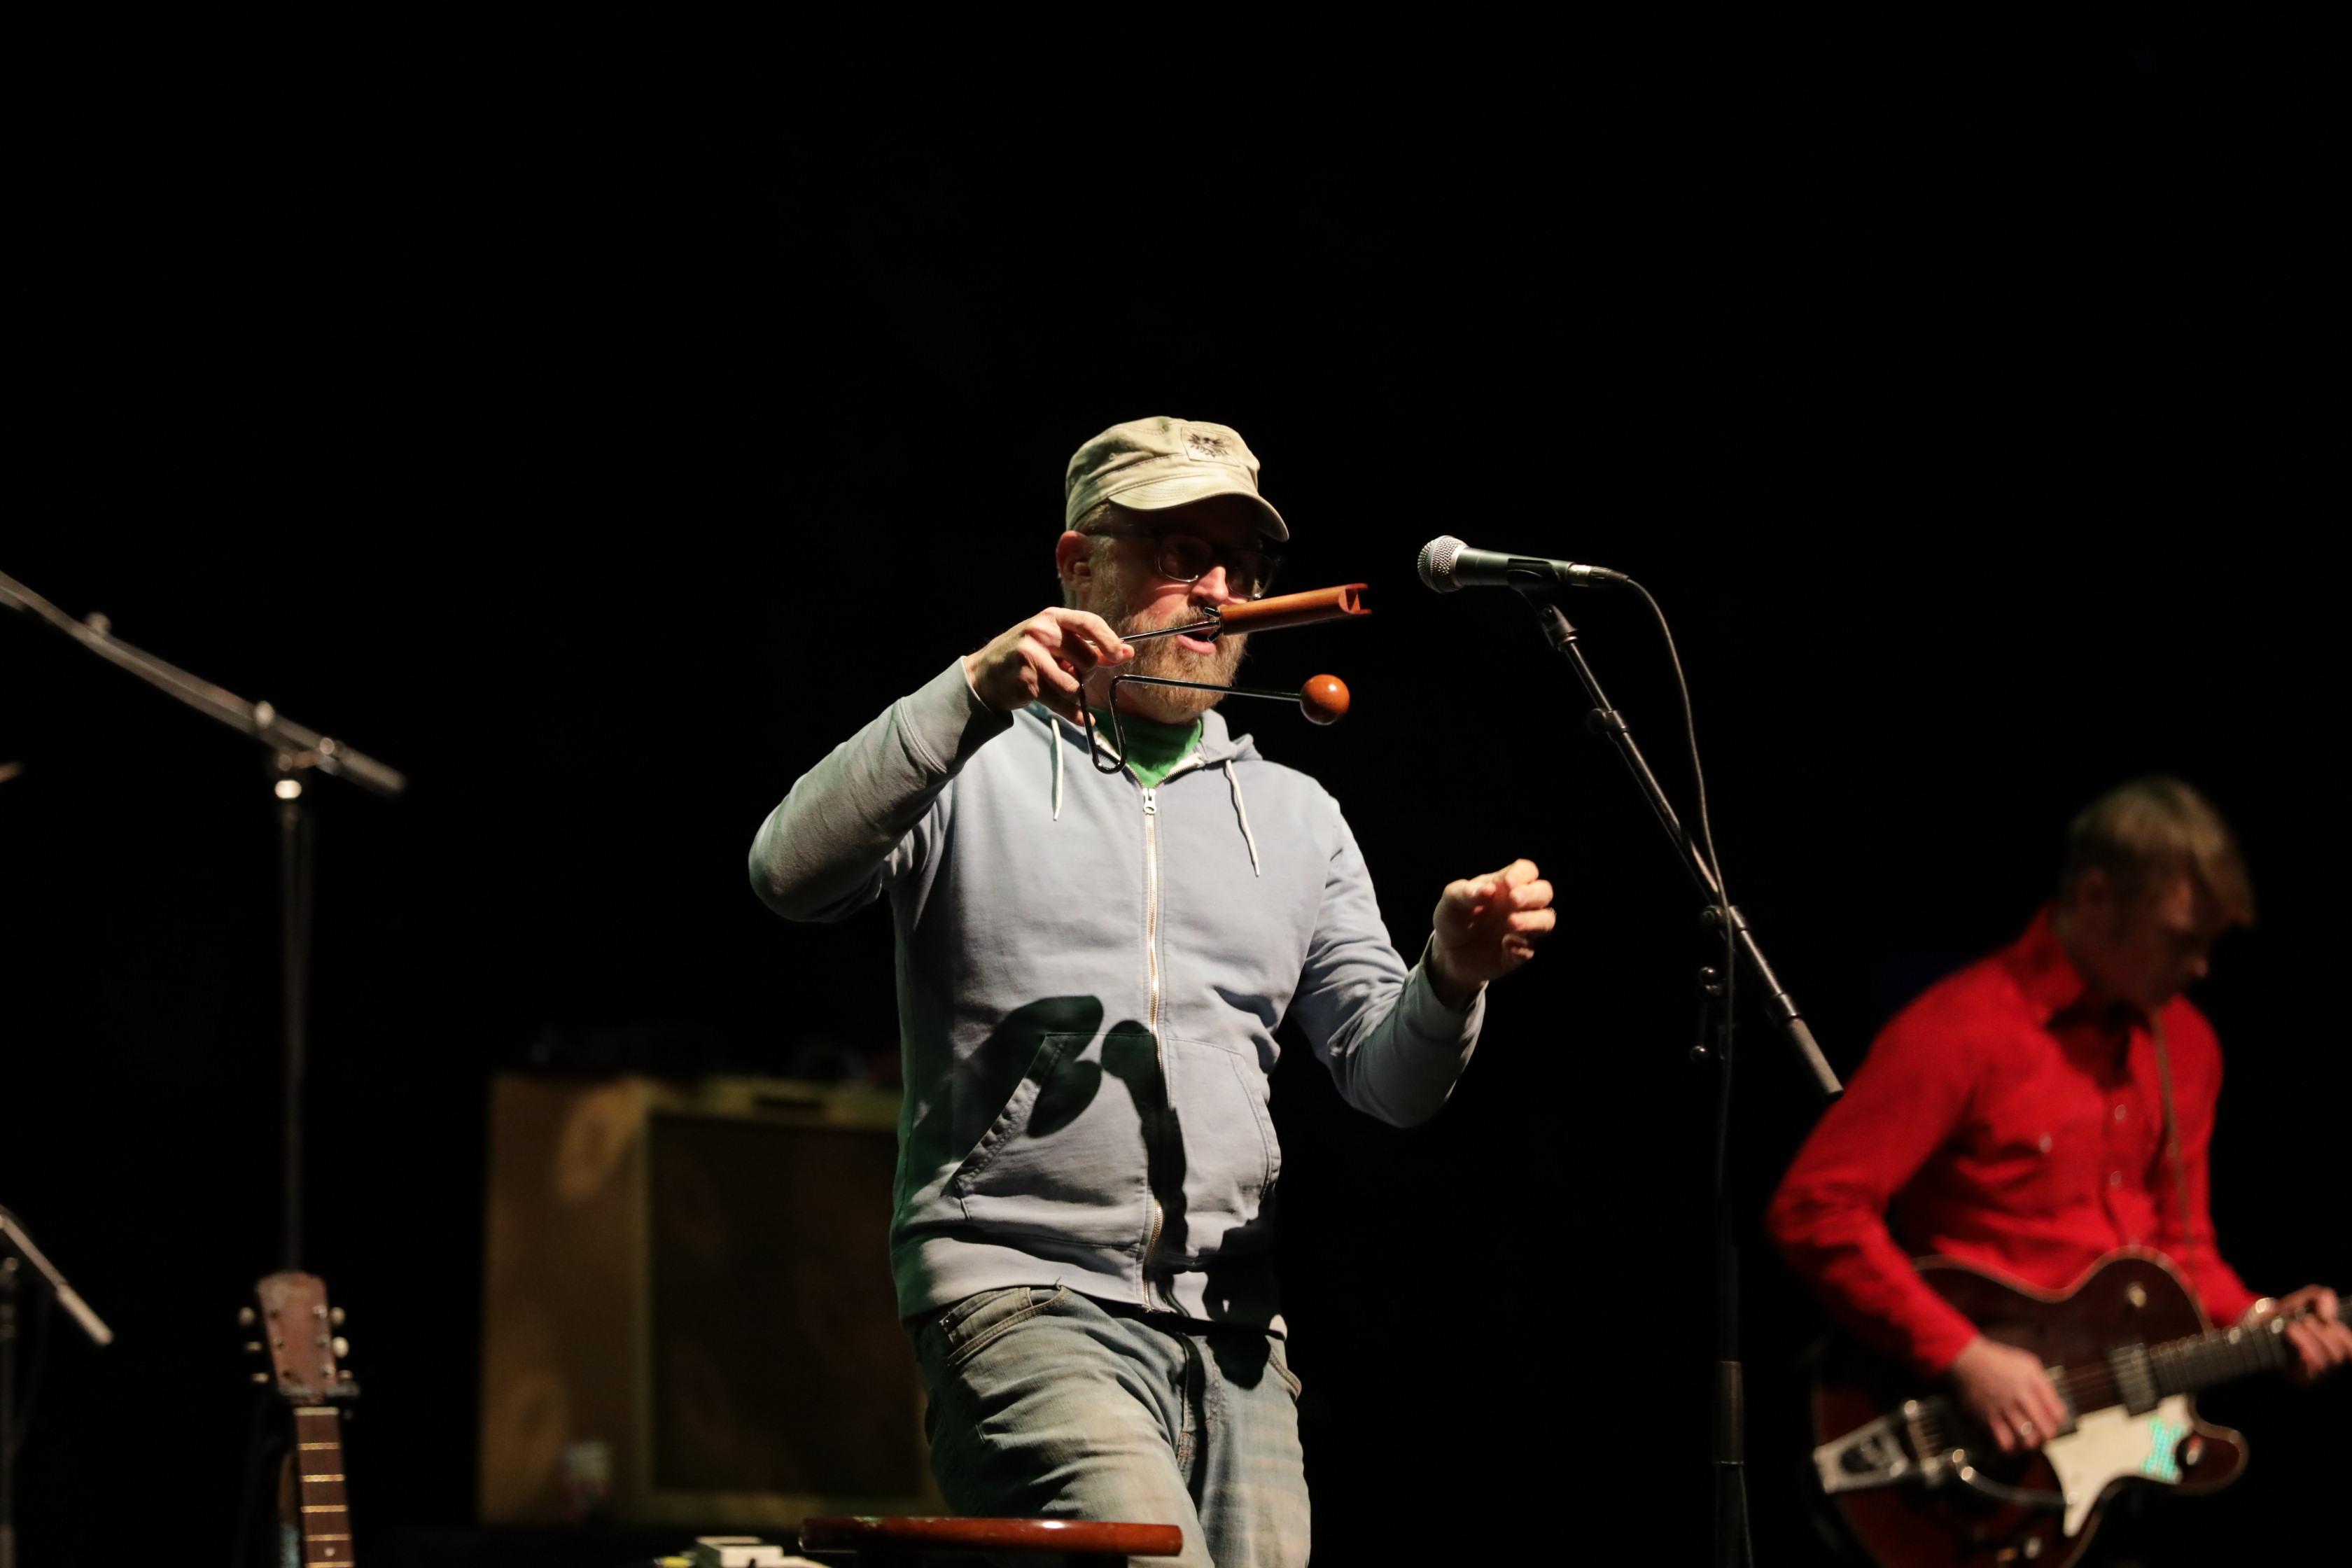 John McCrea plays the vibraslap, a signature instrument for CAKE's sound. Photo: Lmsorenson.net